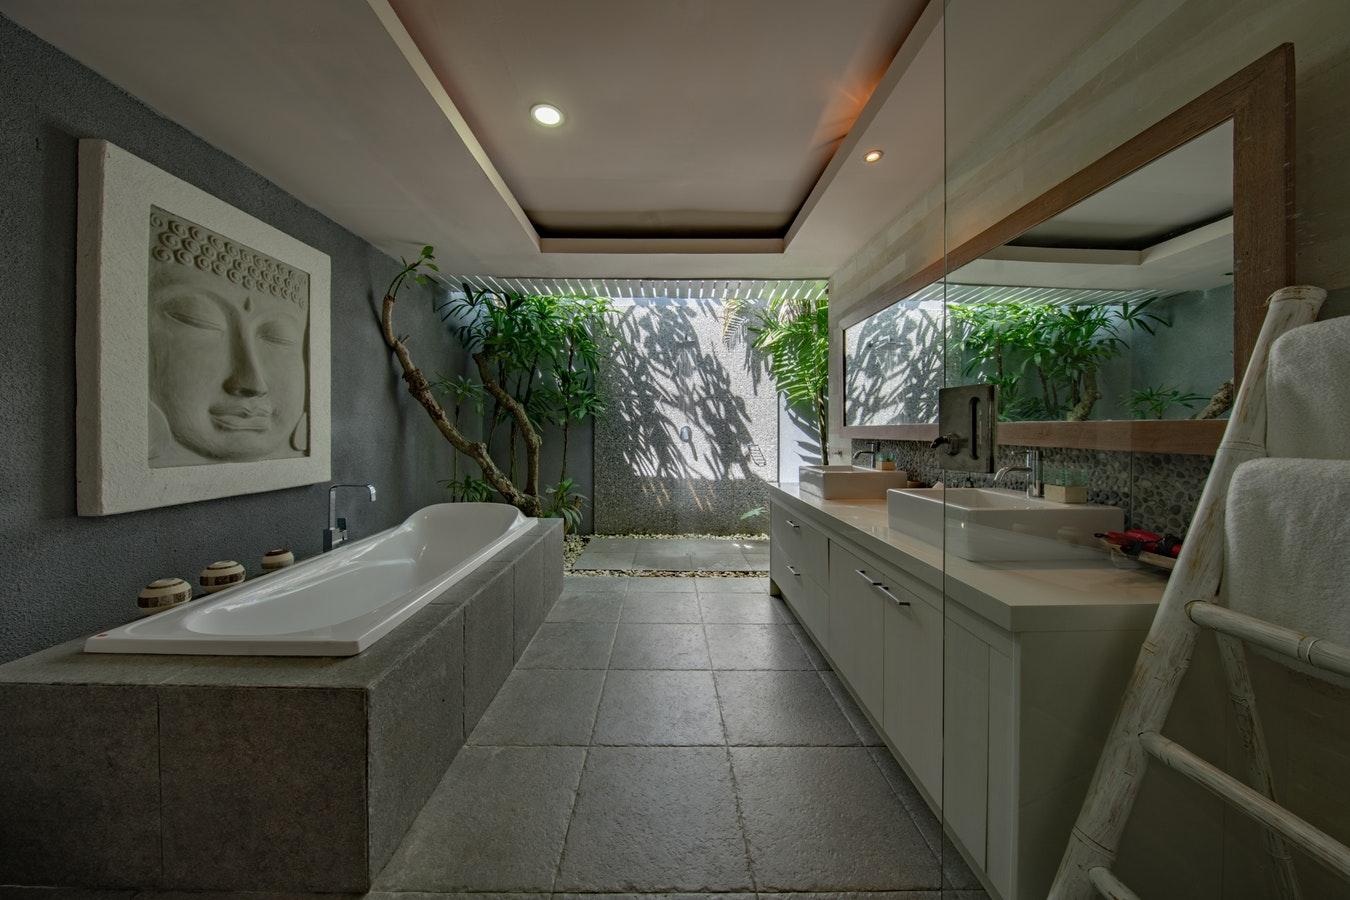 bathtub buying guide undermount tub stone surround